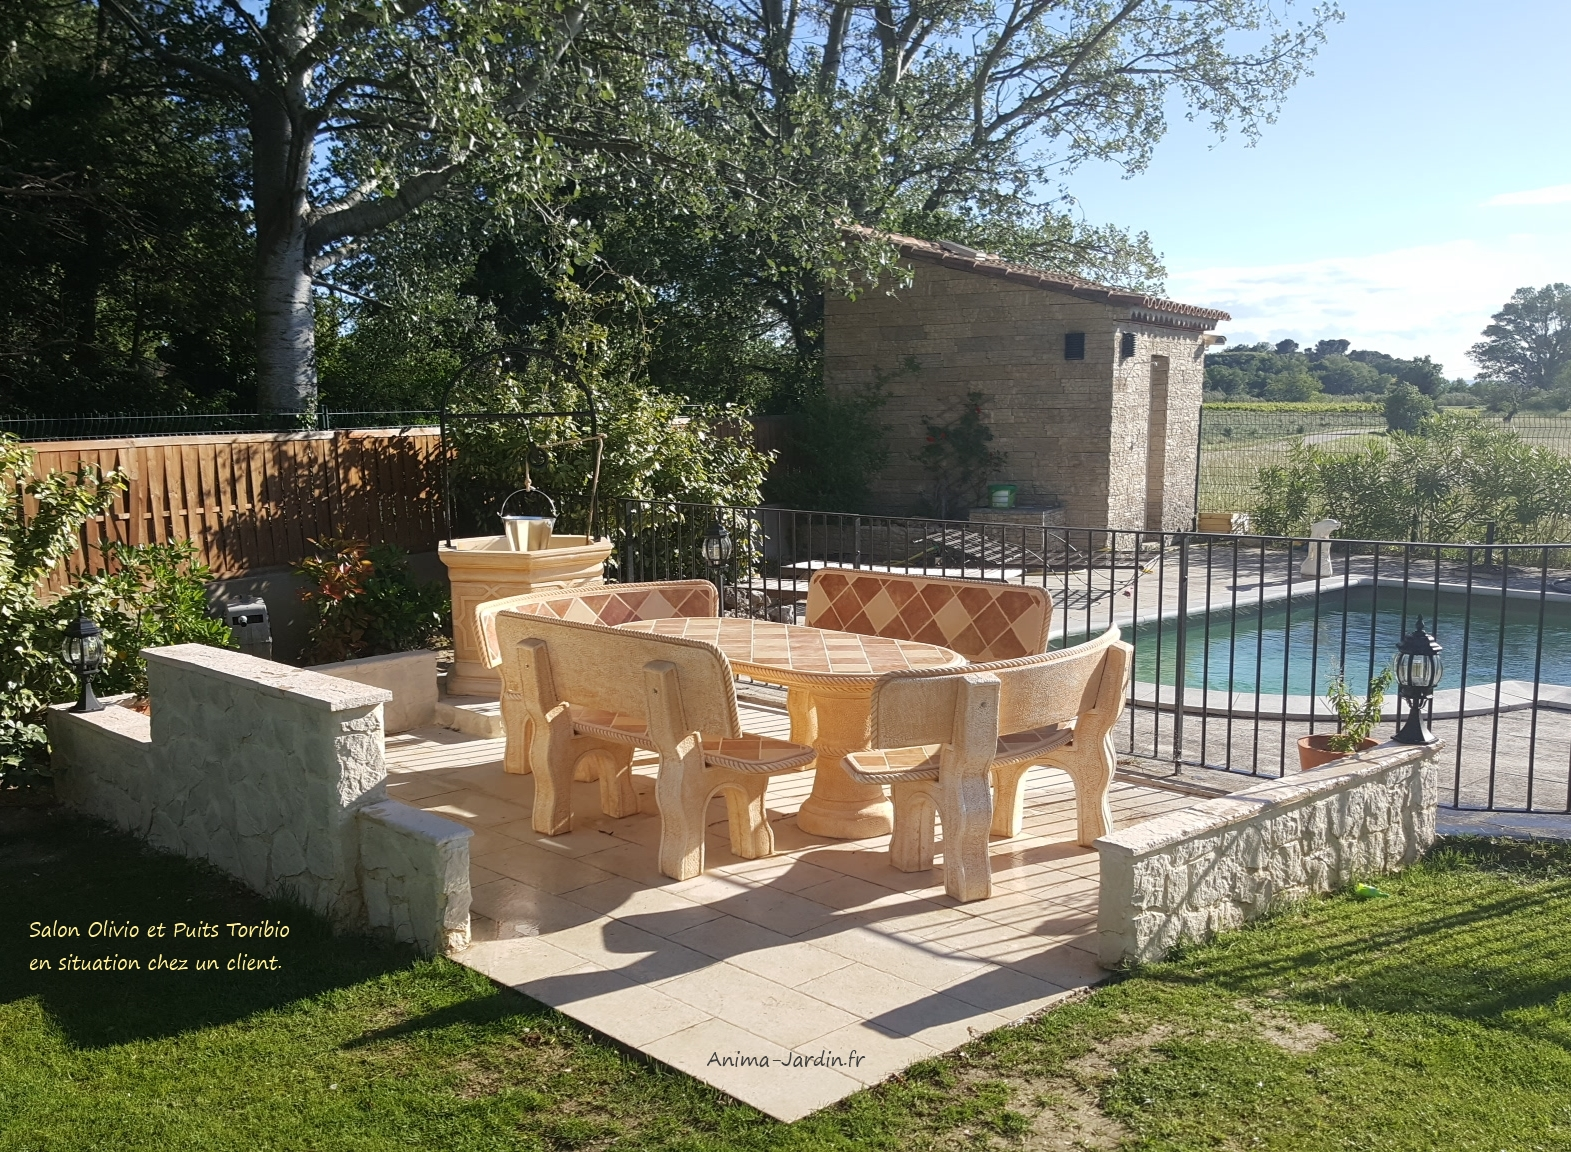 Puits-toribio-Mr-Peres-belle-terrasse-anima-jardin.fr